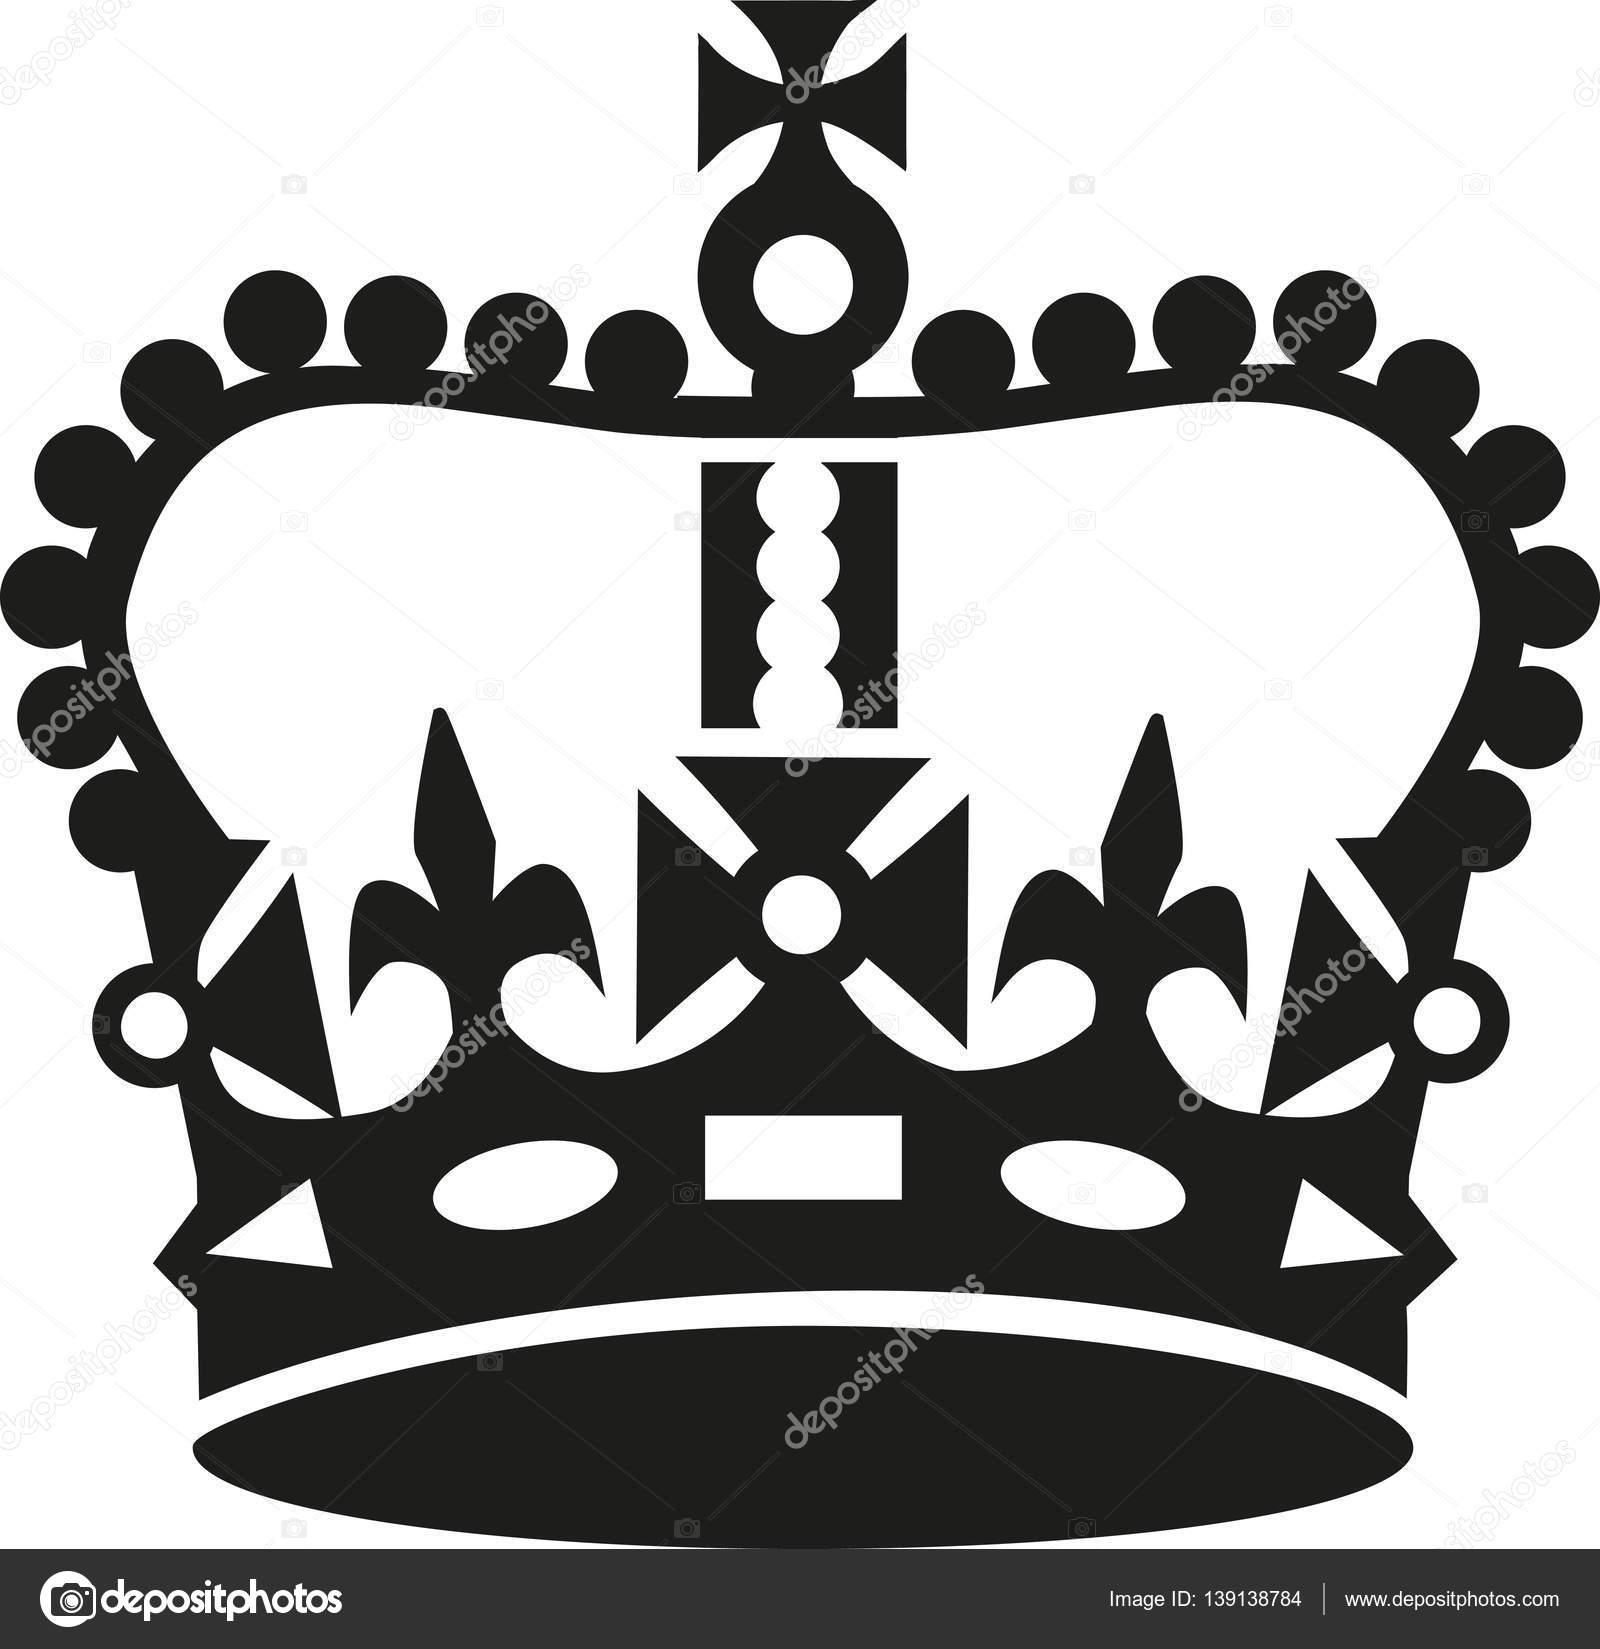 crown in keep calm style stock vector miceking 139138784 rh depositphotos com keep calm vector download keep calm vector generator